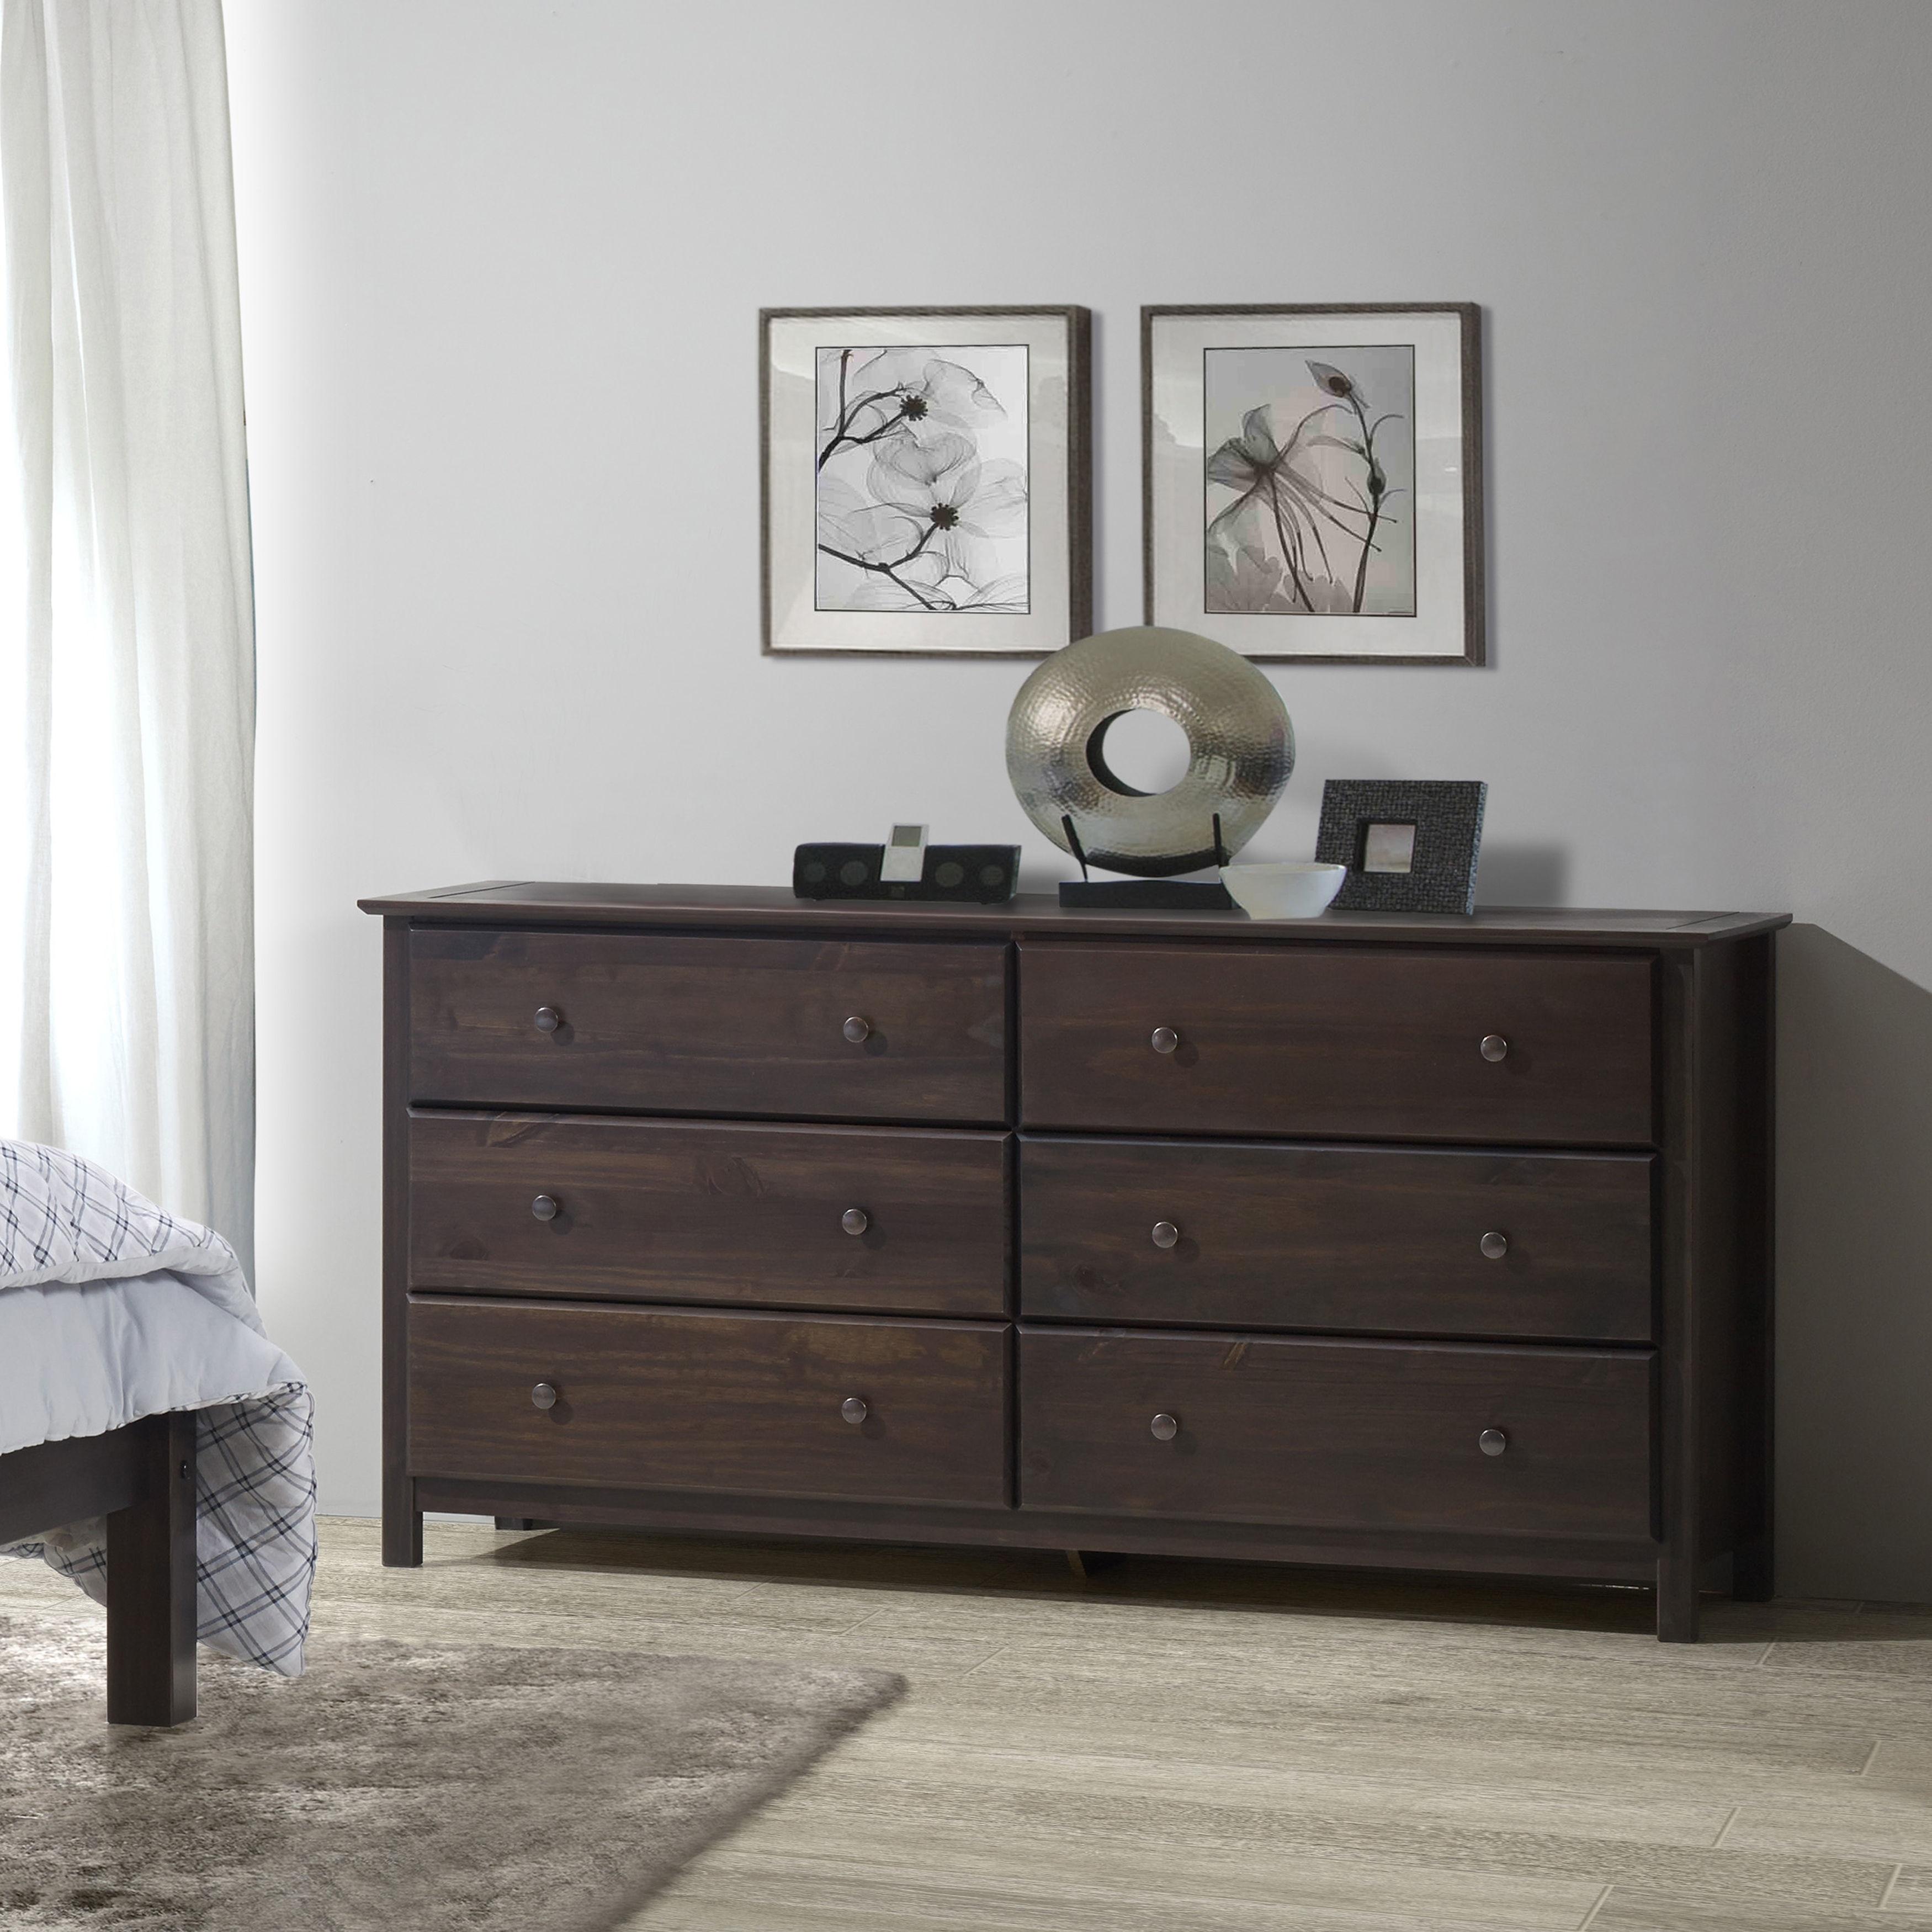 Merveilleux Grain Wood Furniture Shaker 6 Drawer Solid Wood Dresser